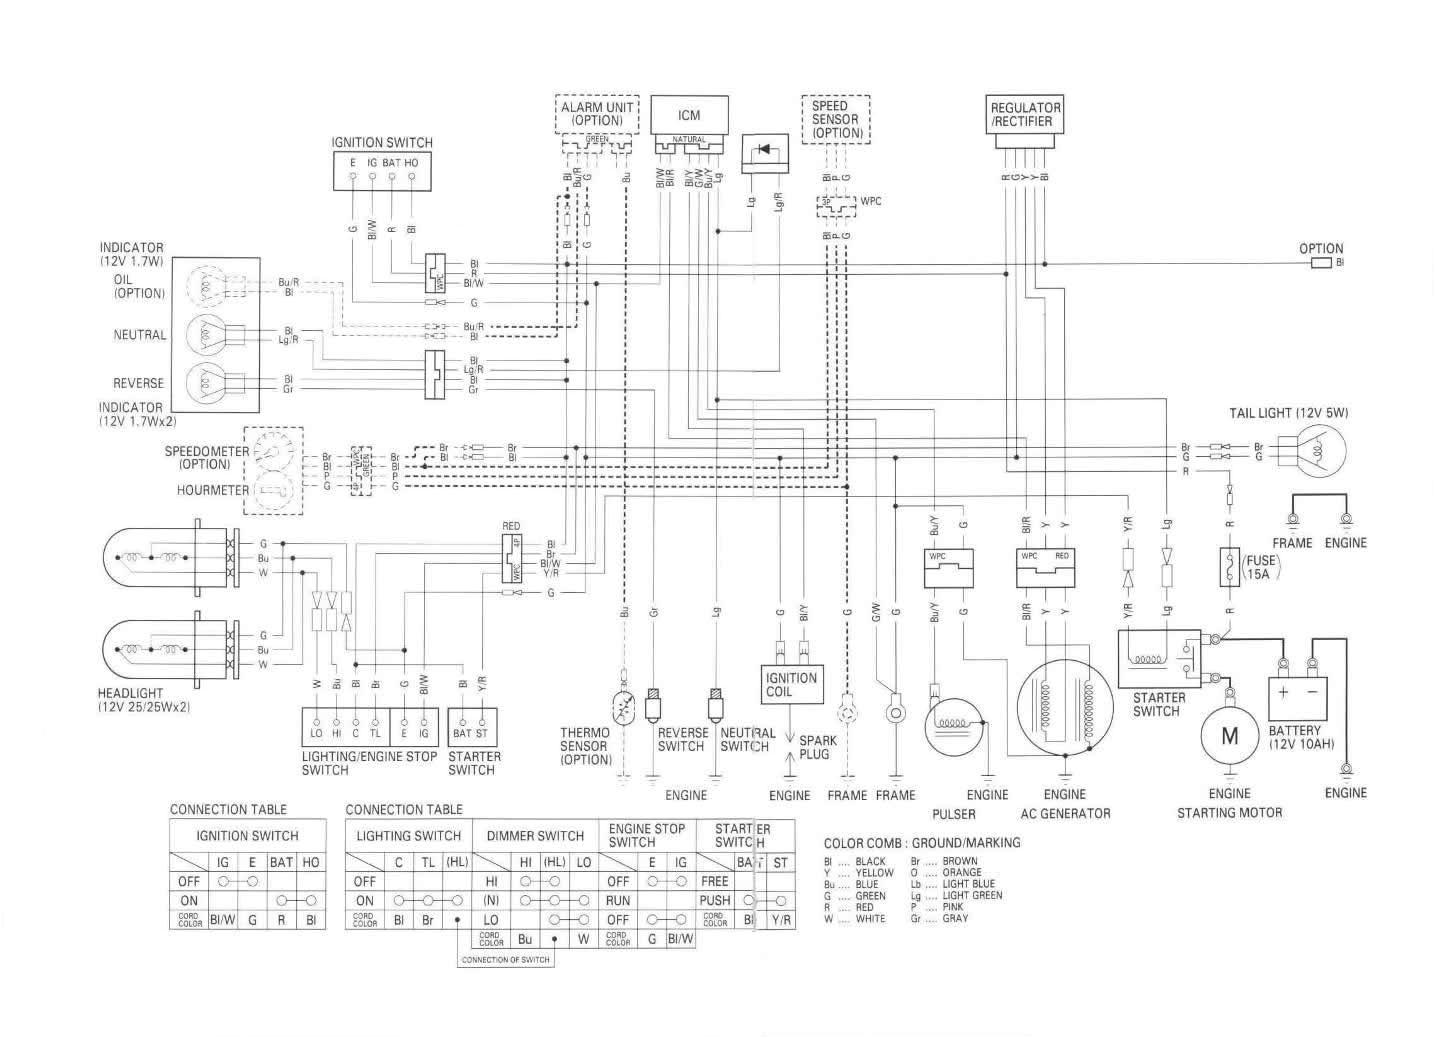 trx 300 wiring diagram manual e bookhonda trx 350 wiring diagram wiring diagram centrewire diagram 2002